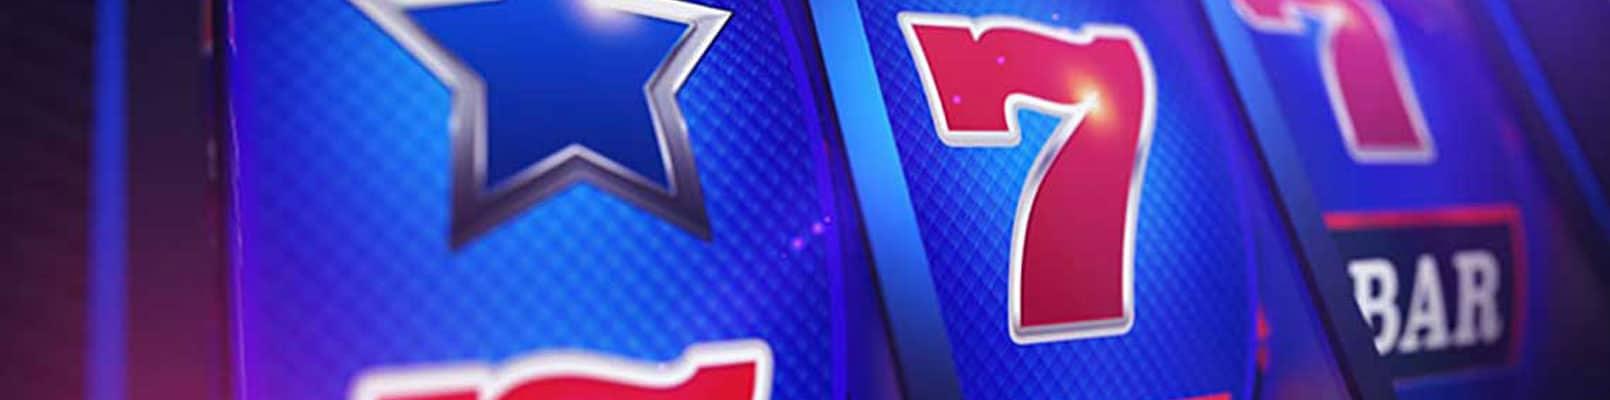 slot winbet casino online